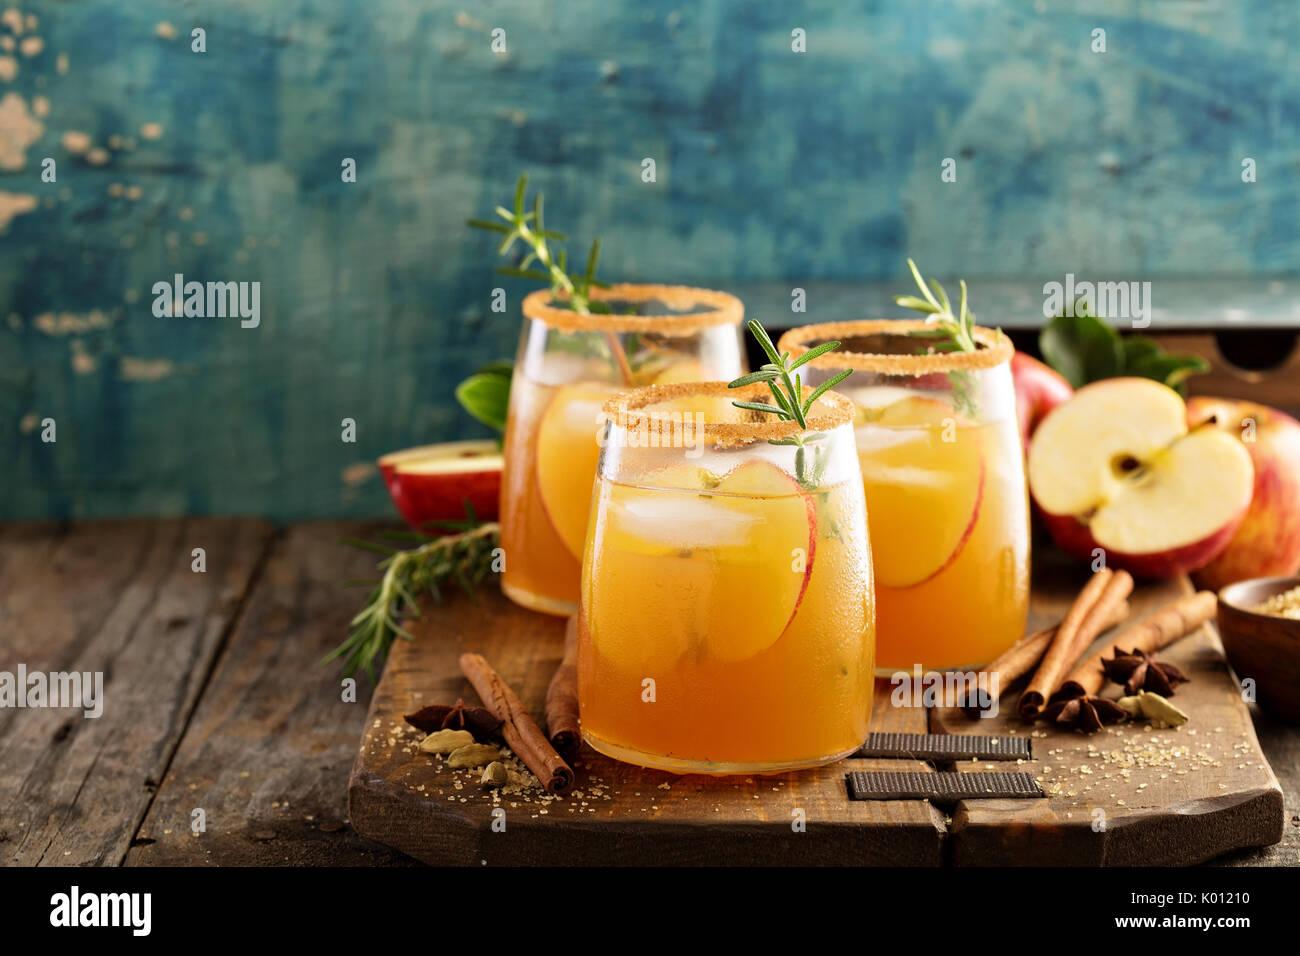 Cóctel con sidra de manzana dura caída especias Imagen De Stock